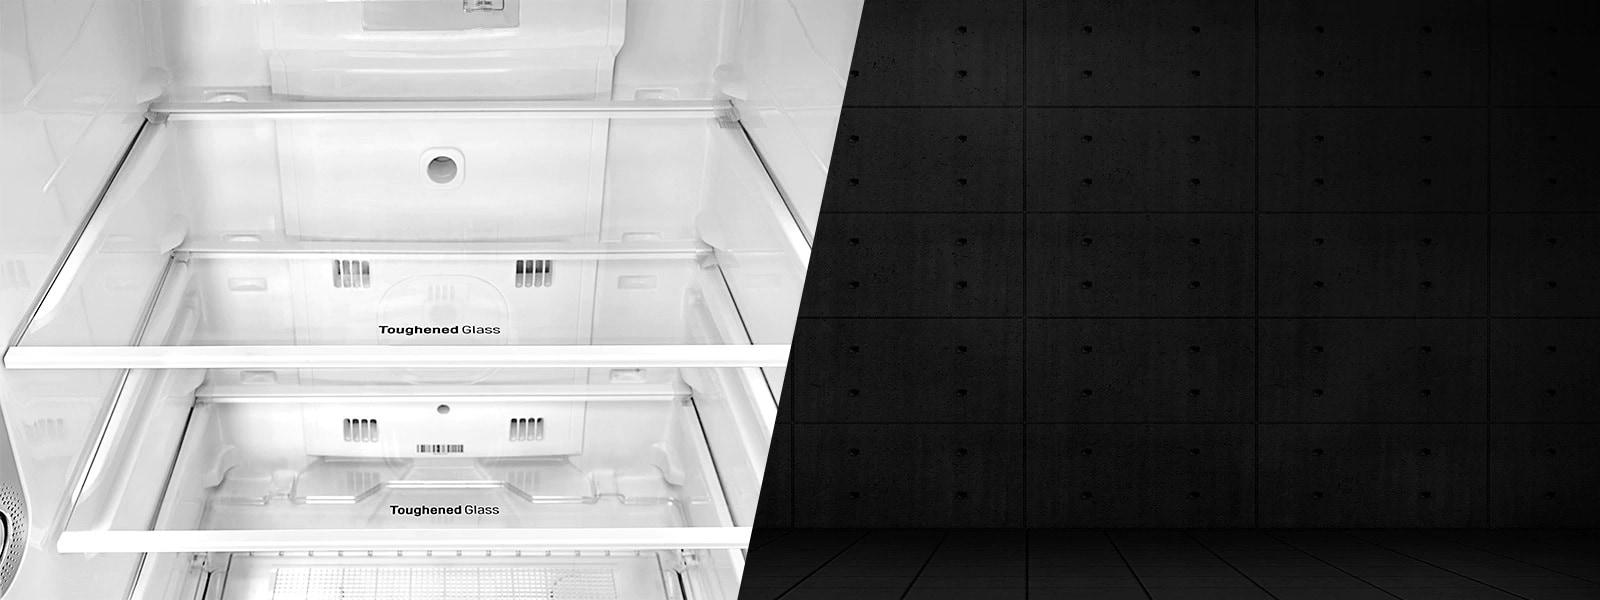 LG GL-S292RPZX Toughened Glass Shelves